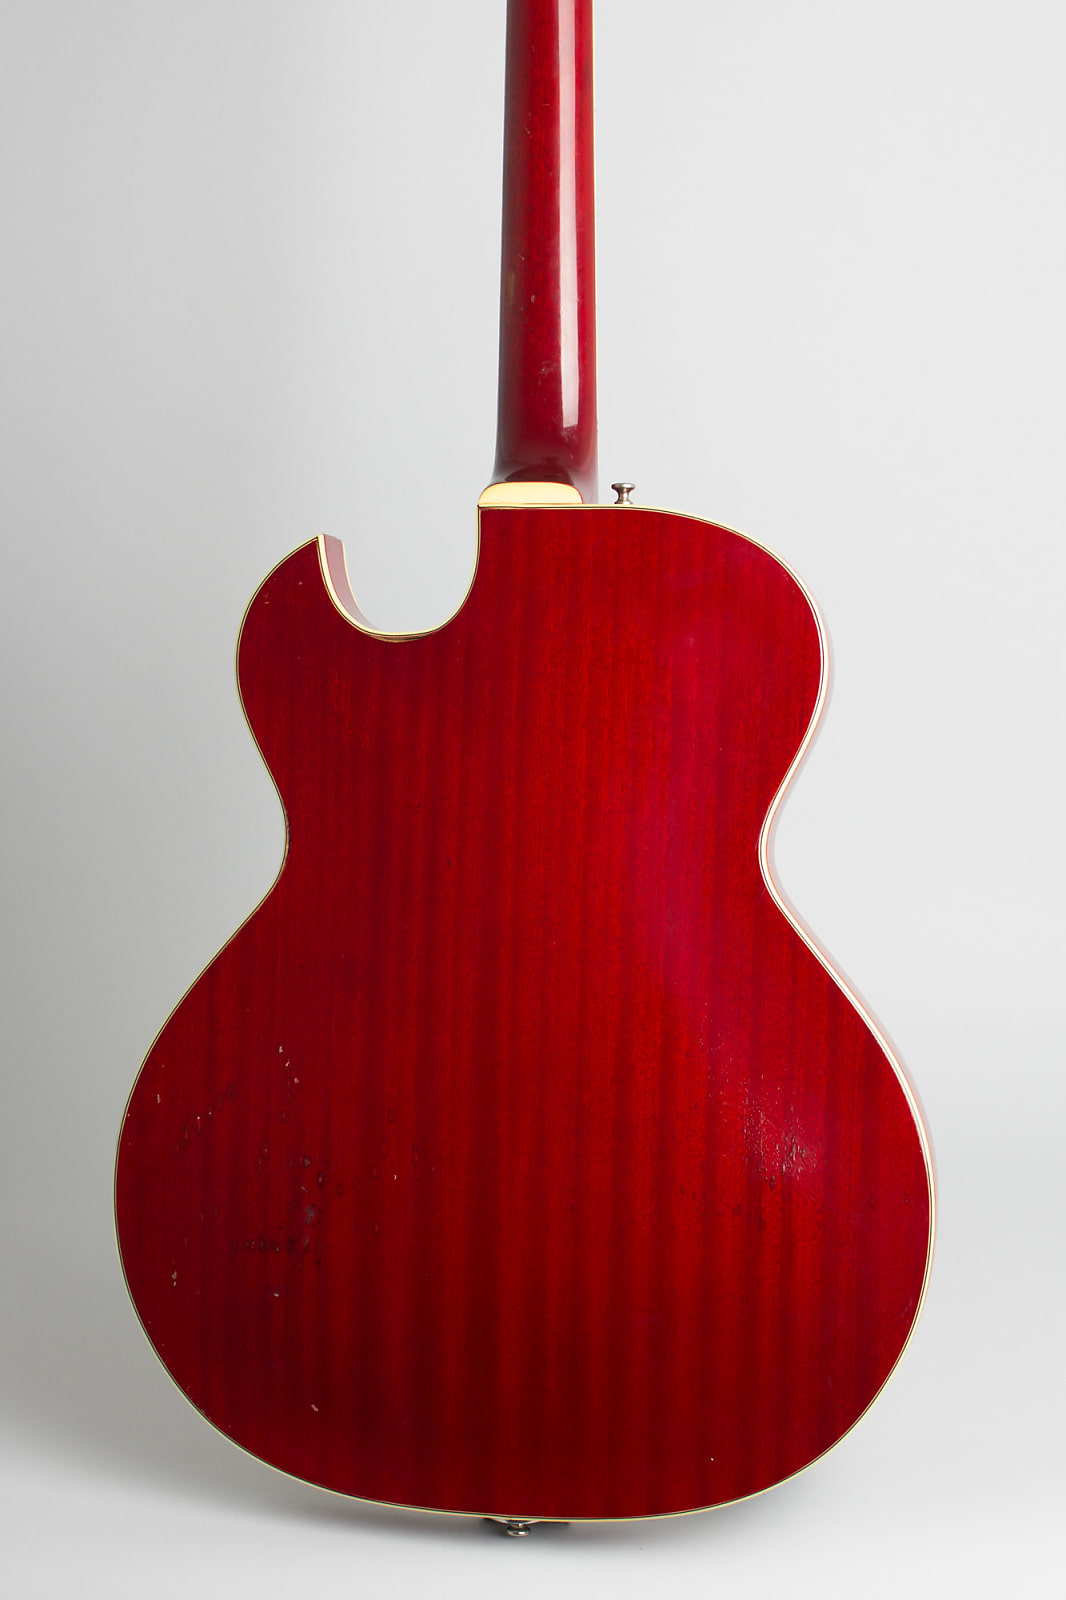 Guild  Starfire III Thinline Hollow Body Electric Guitar (1963), ser. #28831, original black tolex hard shell case.